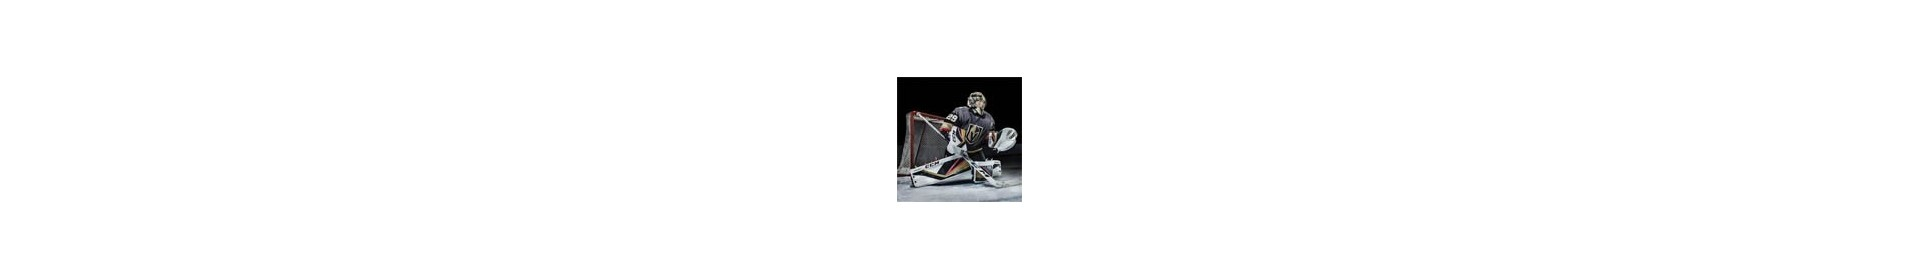 Gardiens Hockey - Le Vestiaire